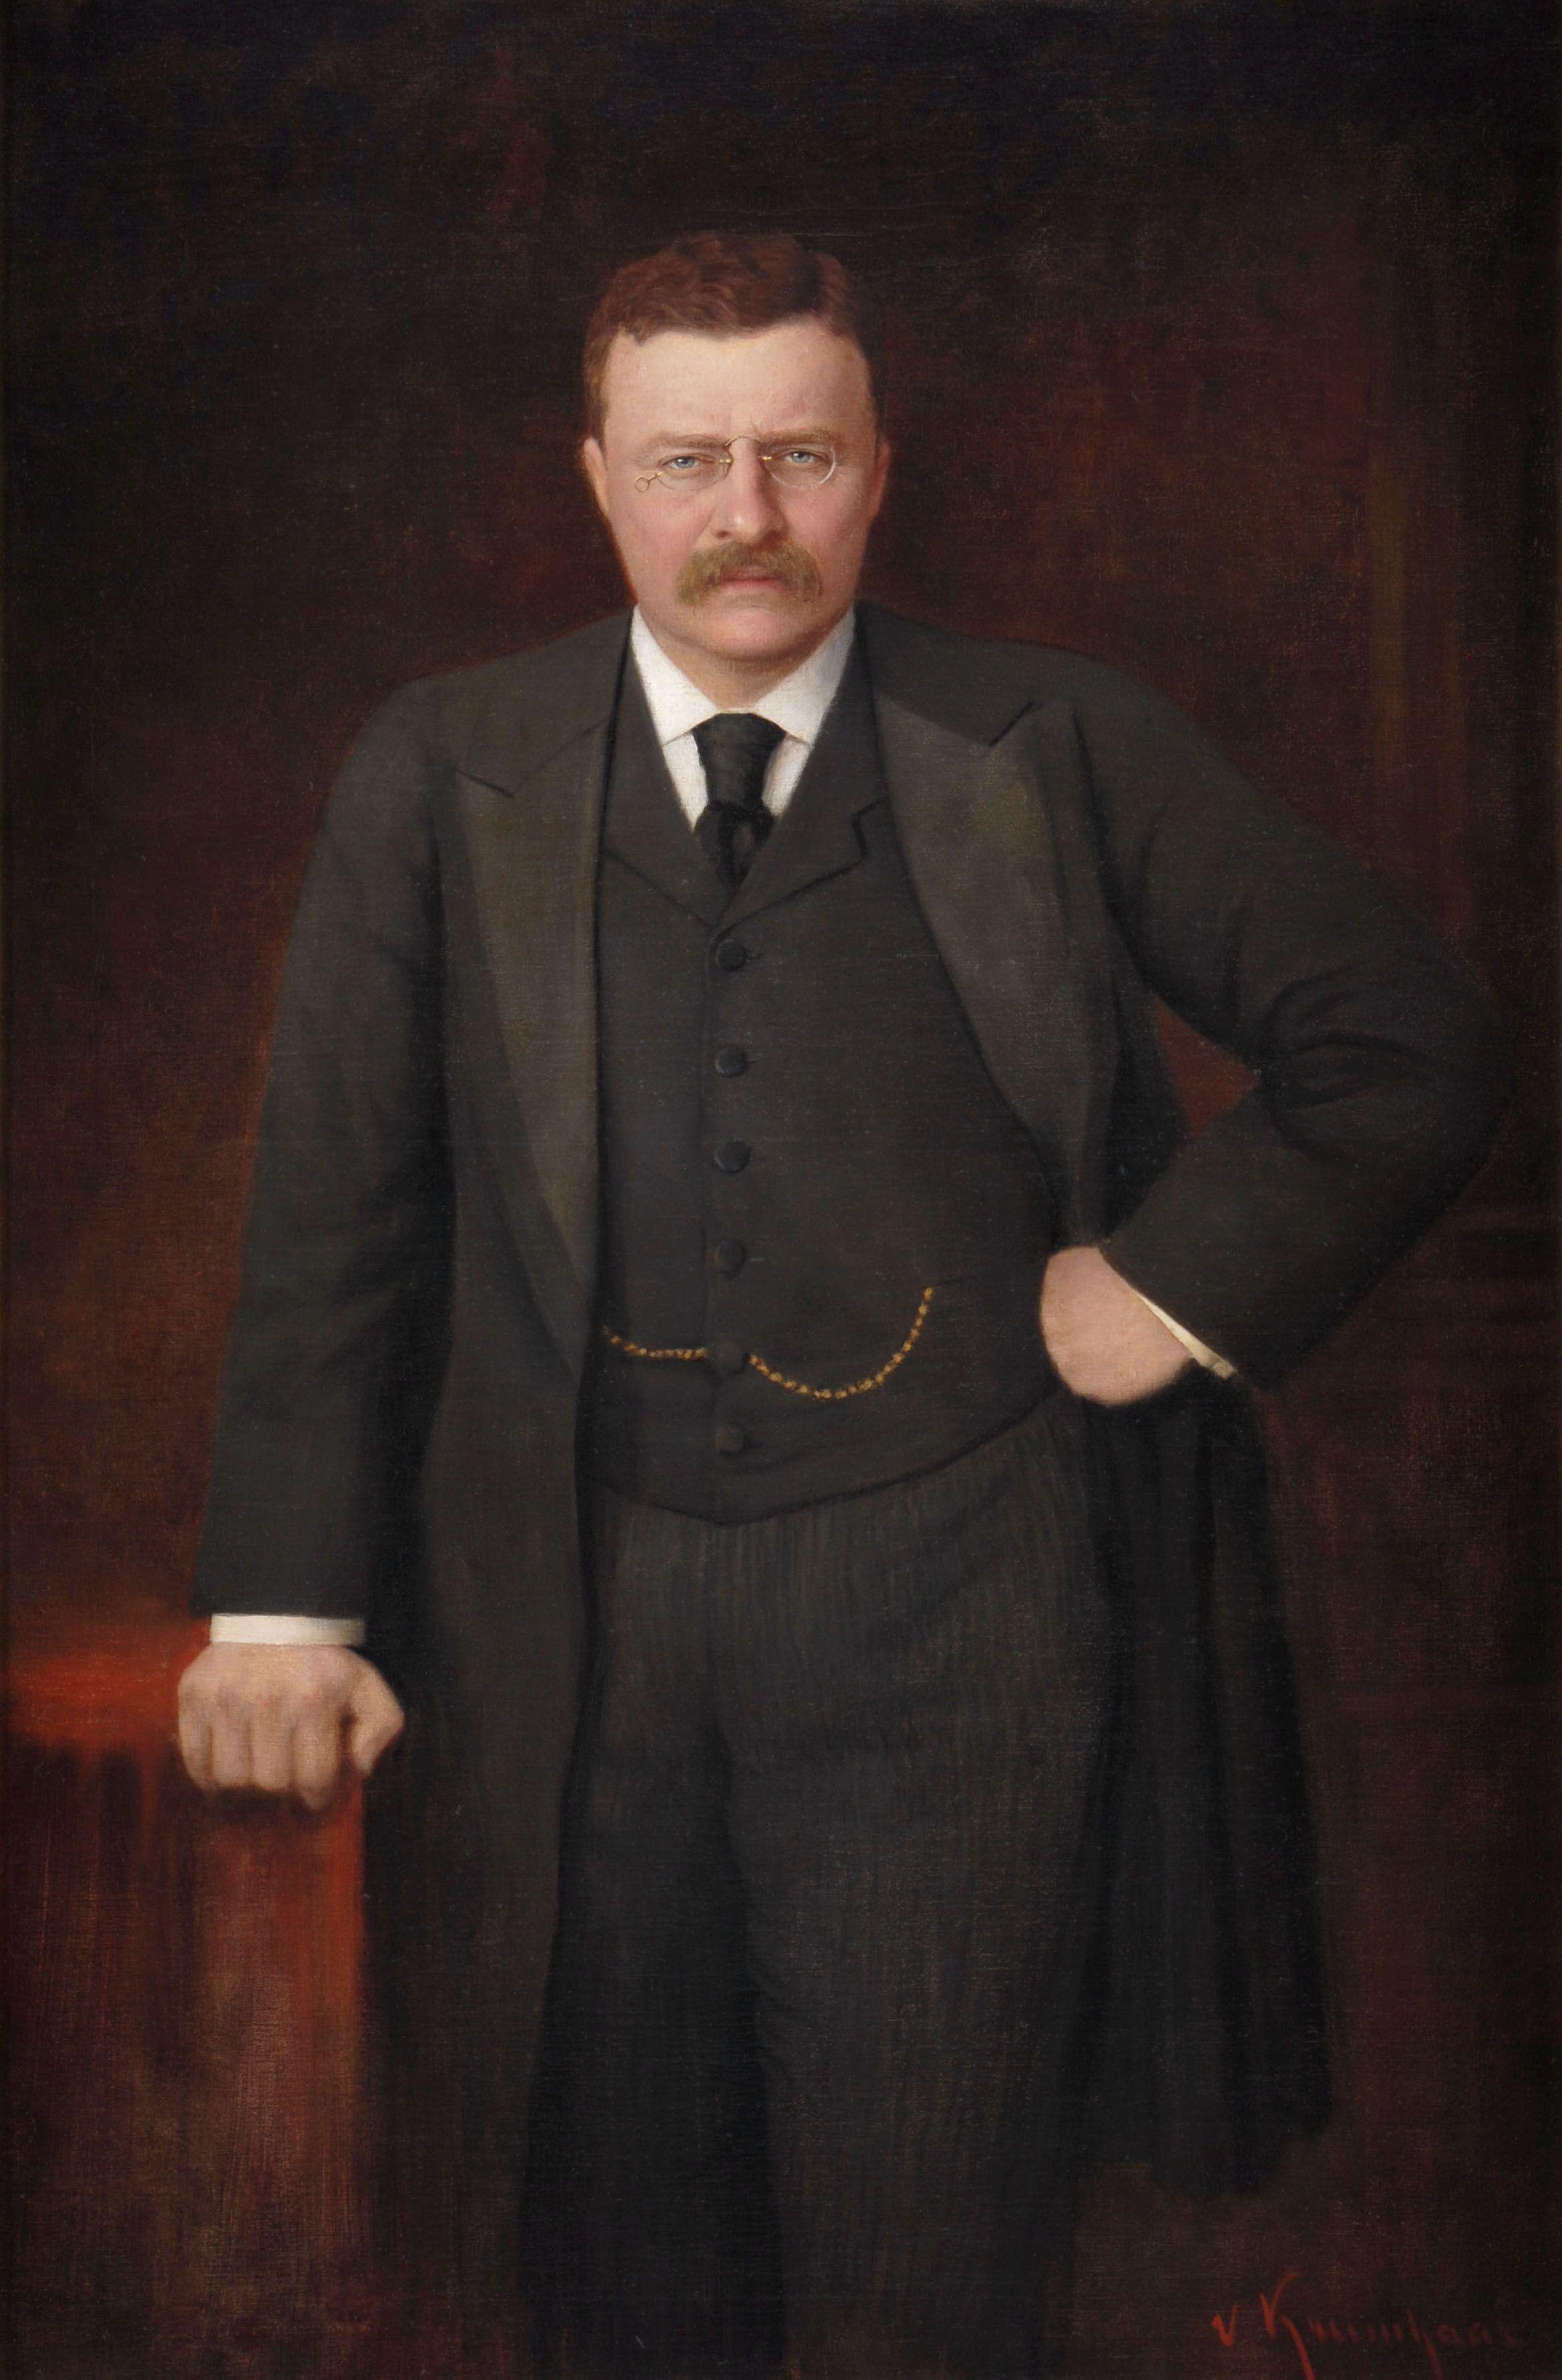 Teddy Roosevelt Portrait : teddy, roosevelt, portrait, 33TheodoreRoosevelt.jpg, (2339×3564), Teddy, Roosevelt,, Theodore, Roosevelt